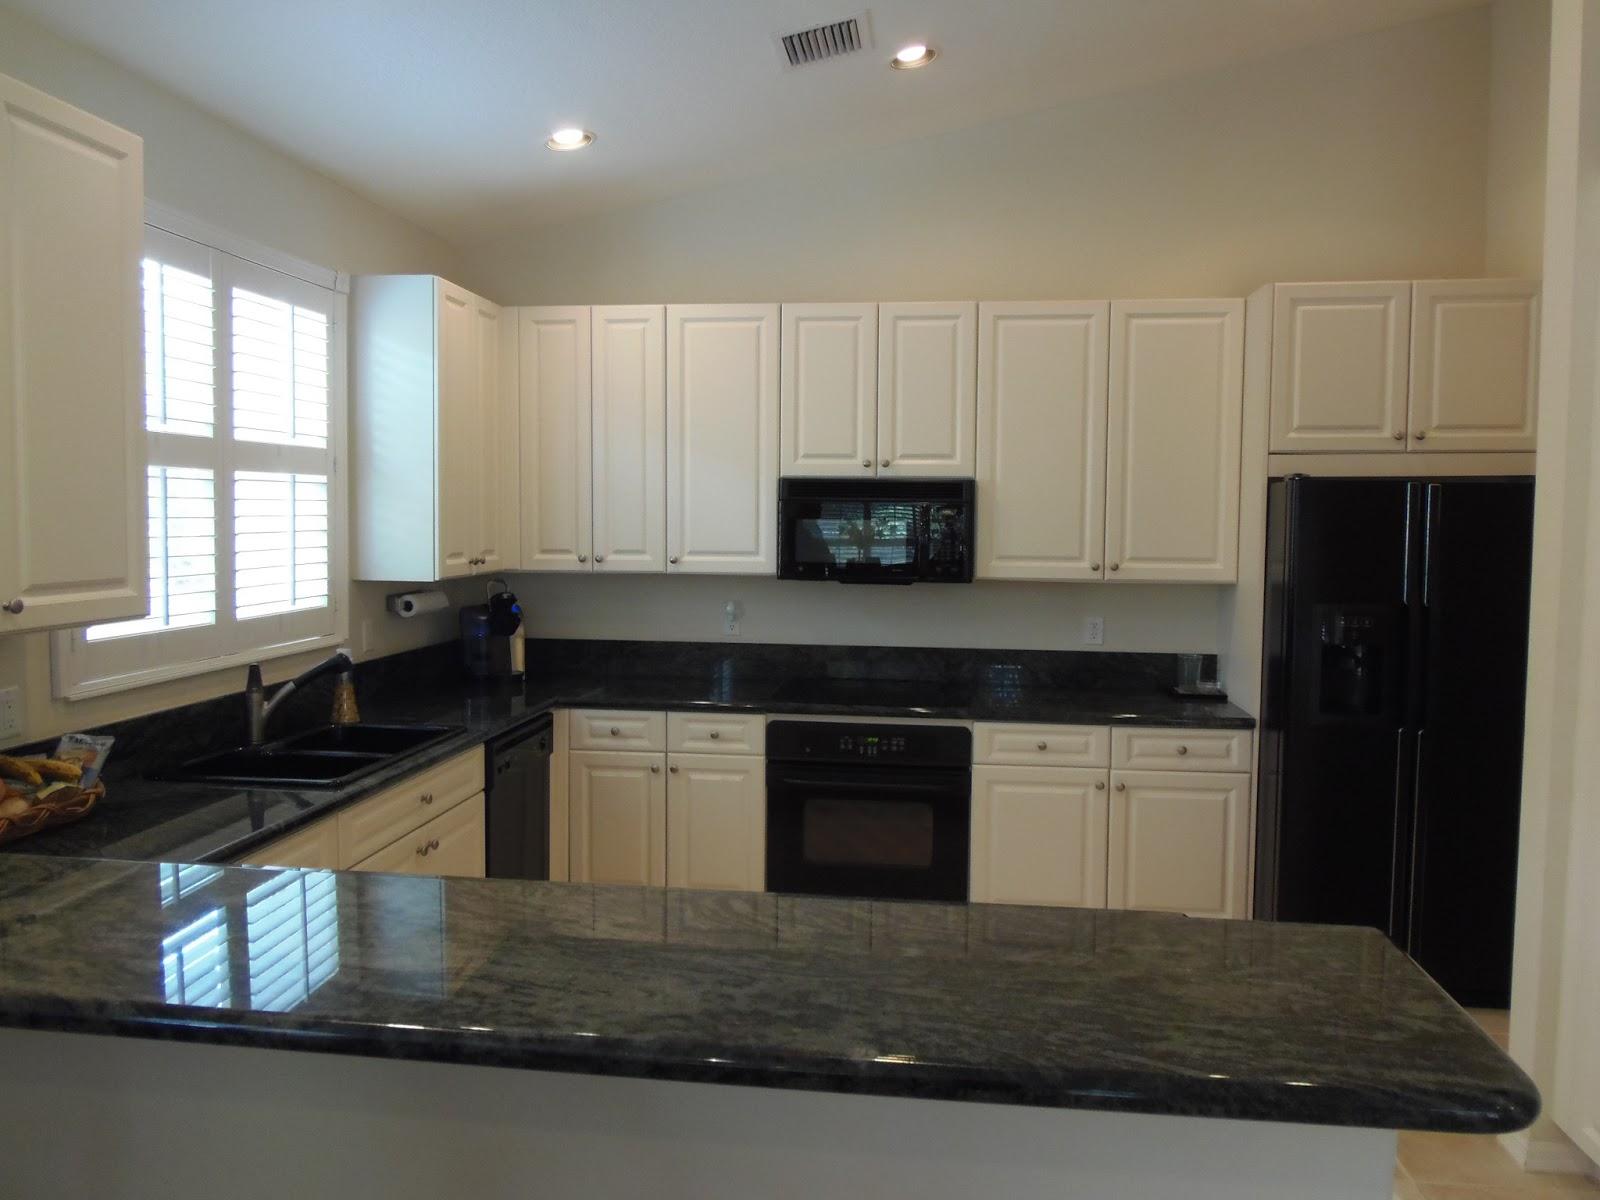 kitchen cabinet color ideas with black appliances photo - 4